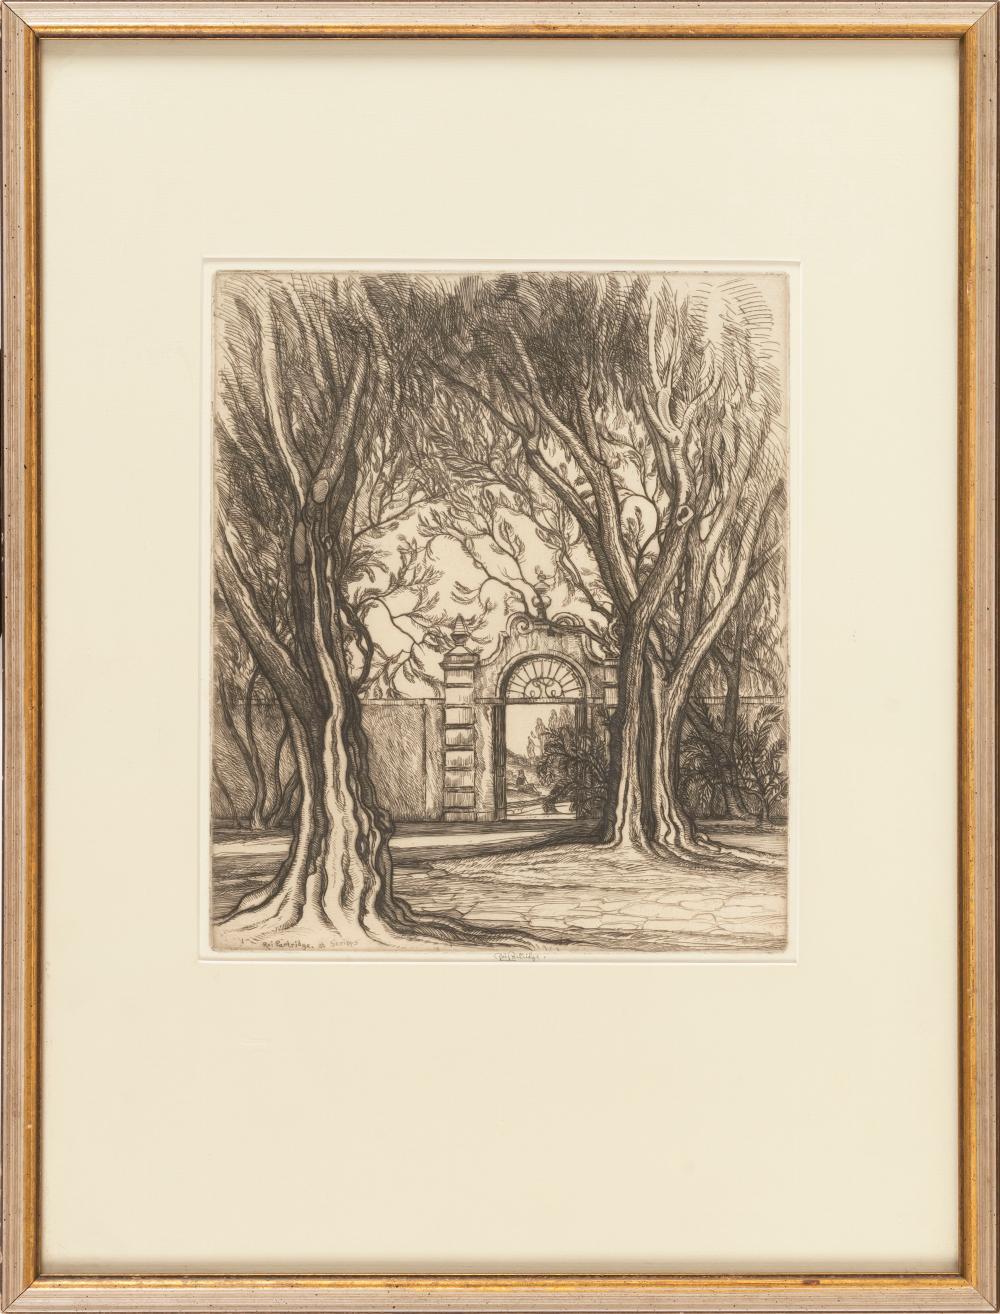 "ROI PARTRIDGE, California/Washington, 1888-1984, ""Gateway at Scripps""., Etching on paper, 11.25"" x 9.25"" sight. Framed 21"" x 16""."